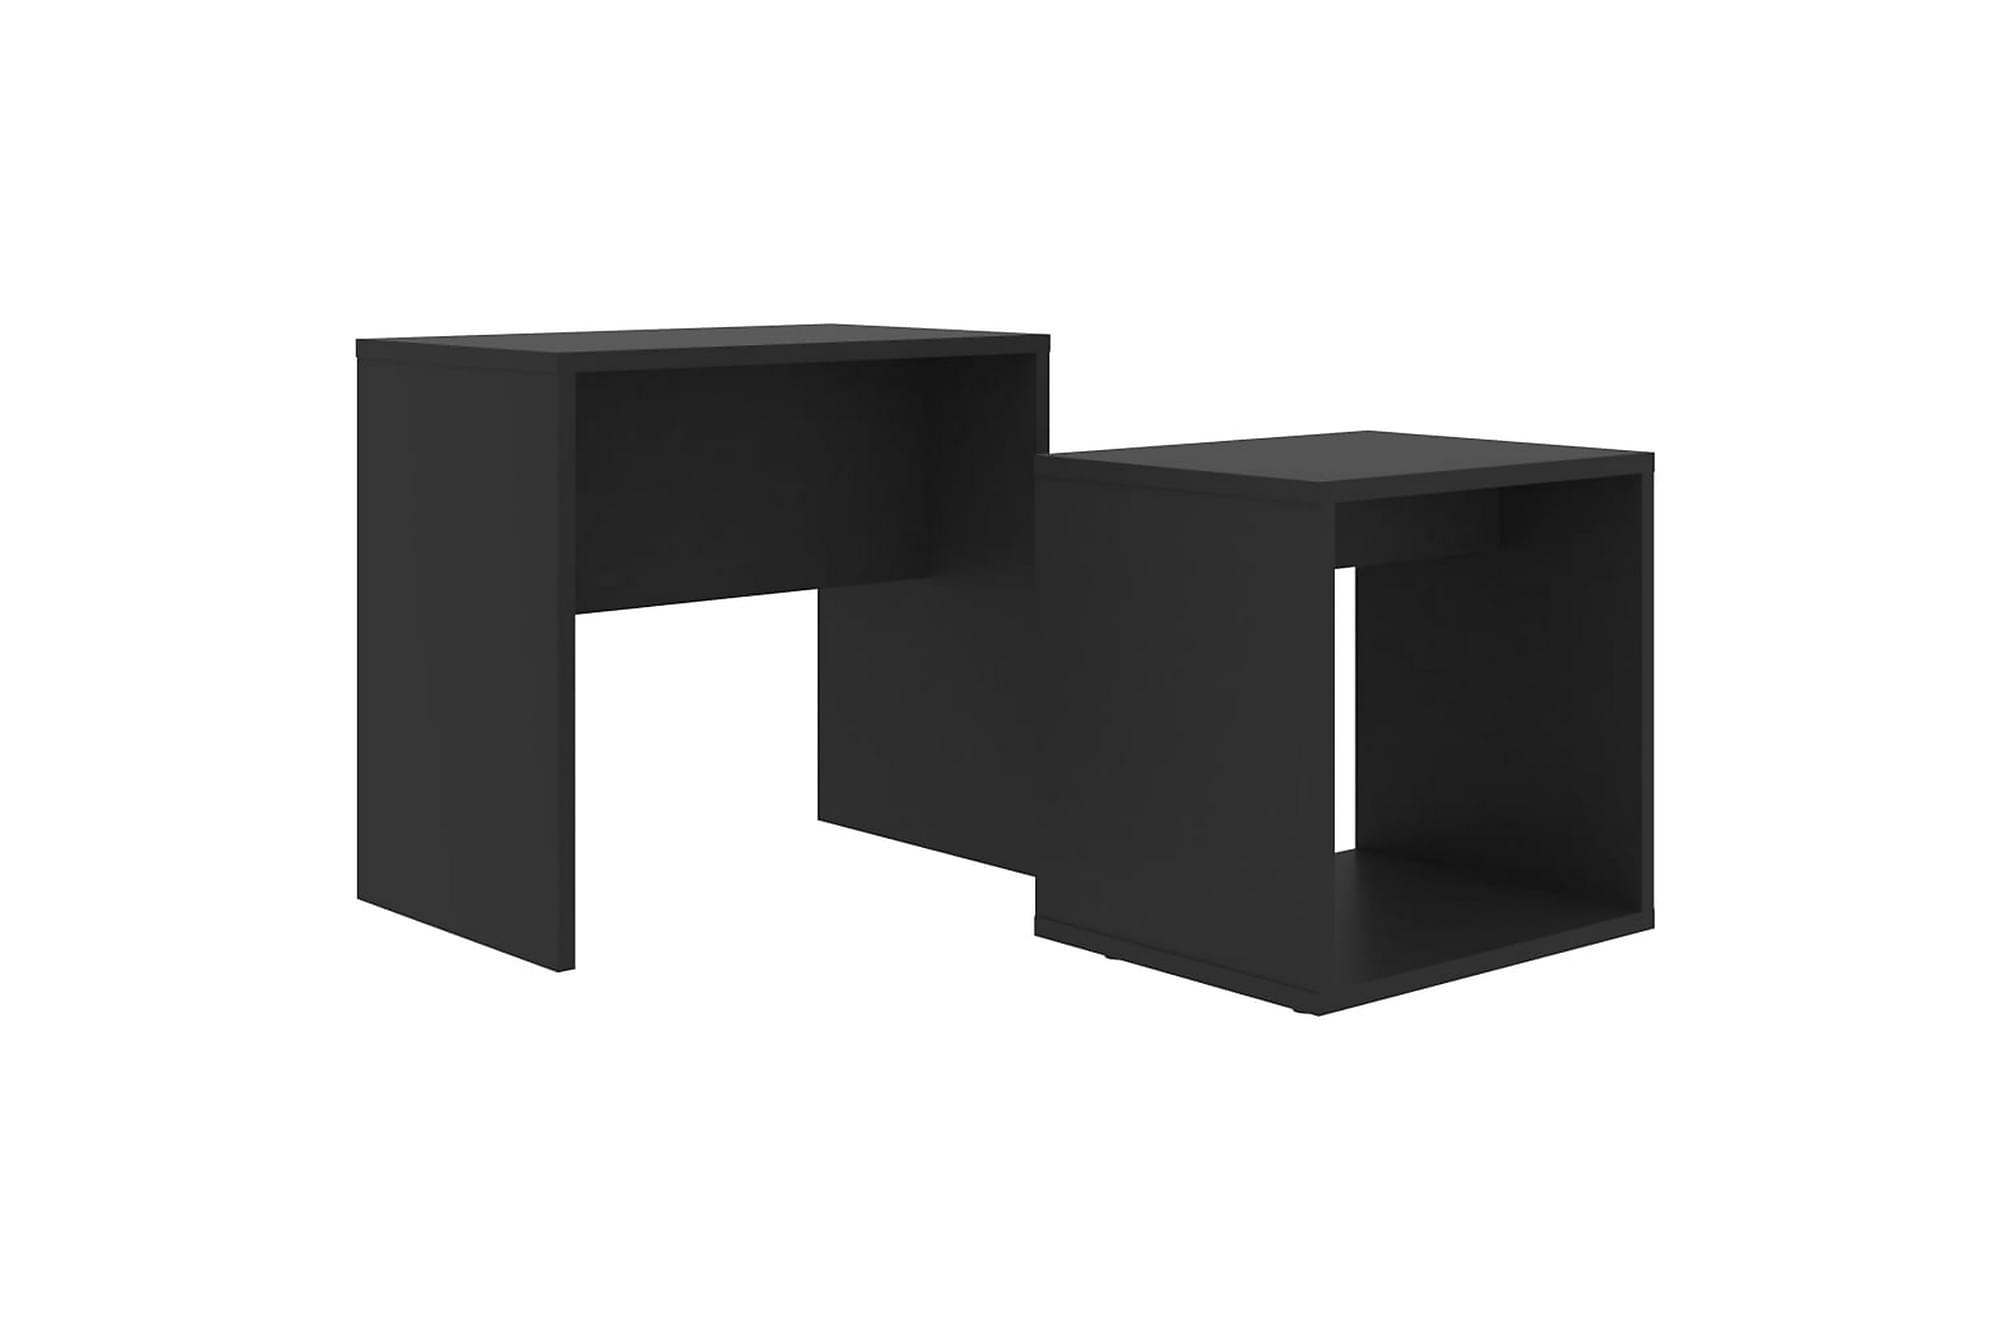 Soffbord set svart 48x30x45 cm spånskiva